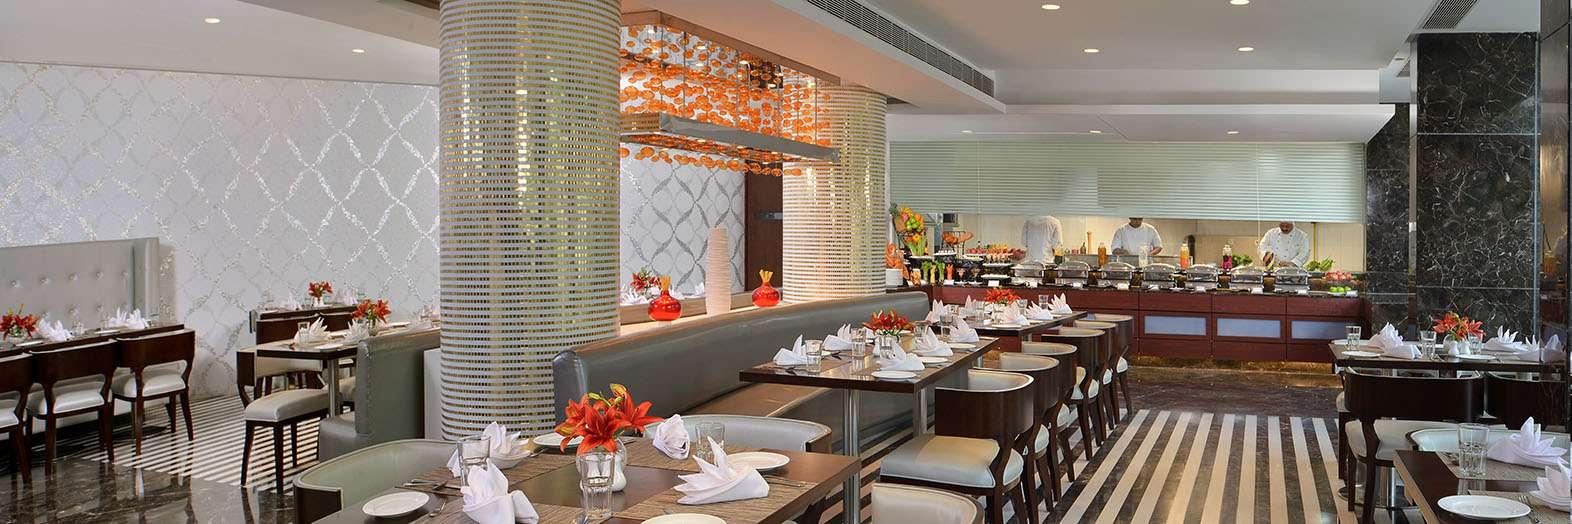 Restaurants in Bhubaneswar